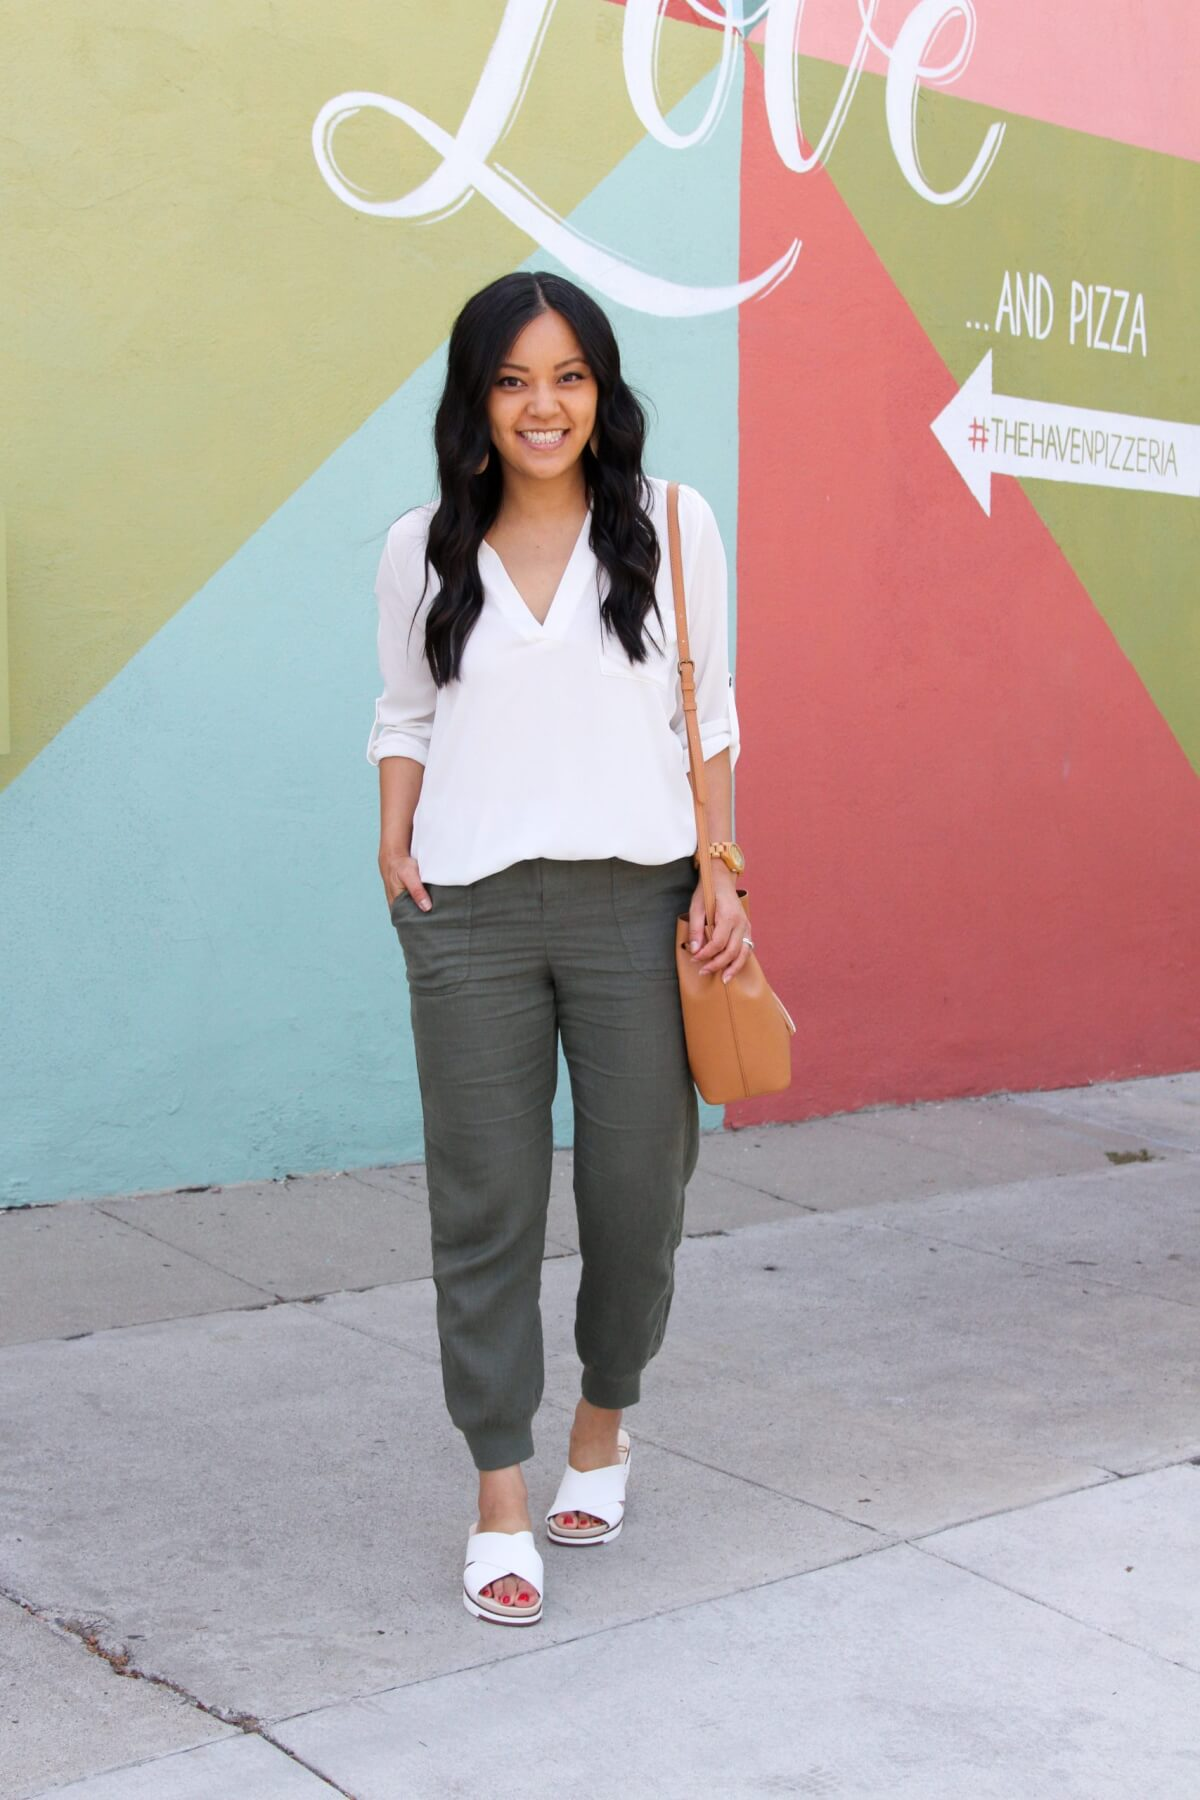 Summer Linen Pants Outfit: white v-neck tunic + olive linen joggers + white slide sandals + tan crossbody bag + tan leather earrings